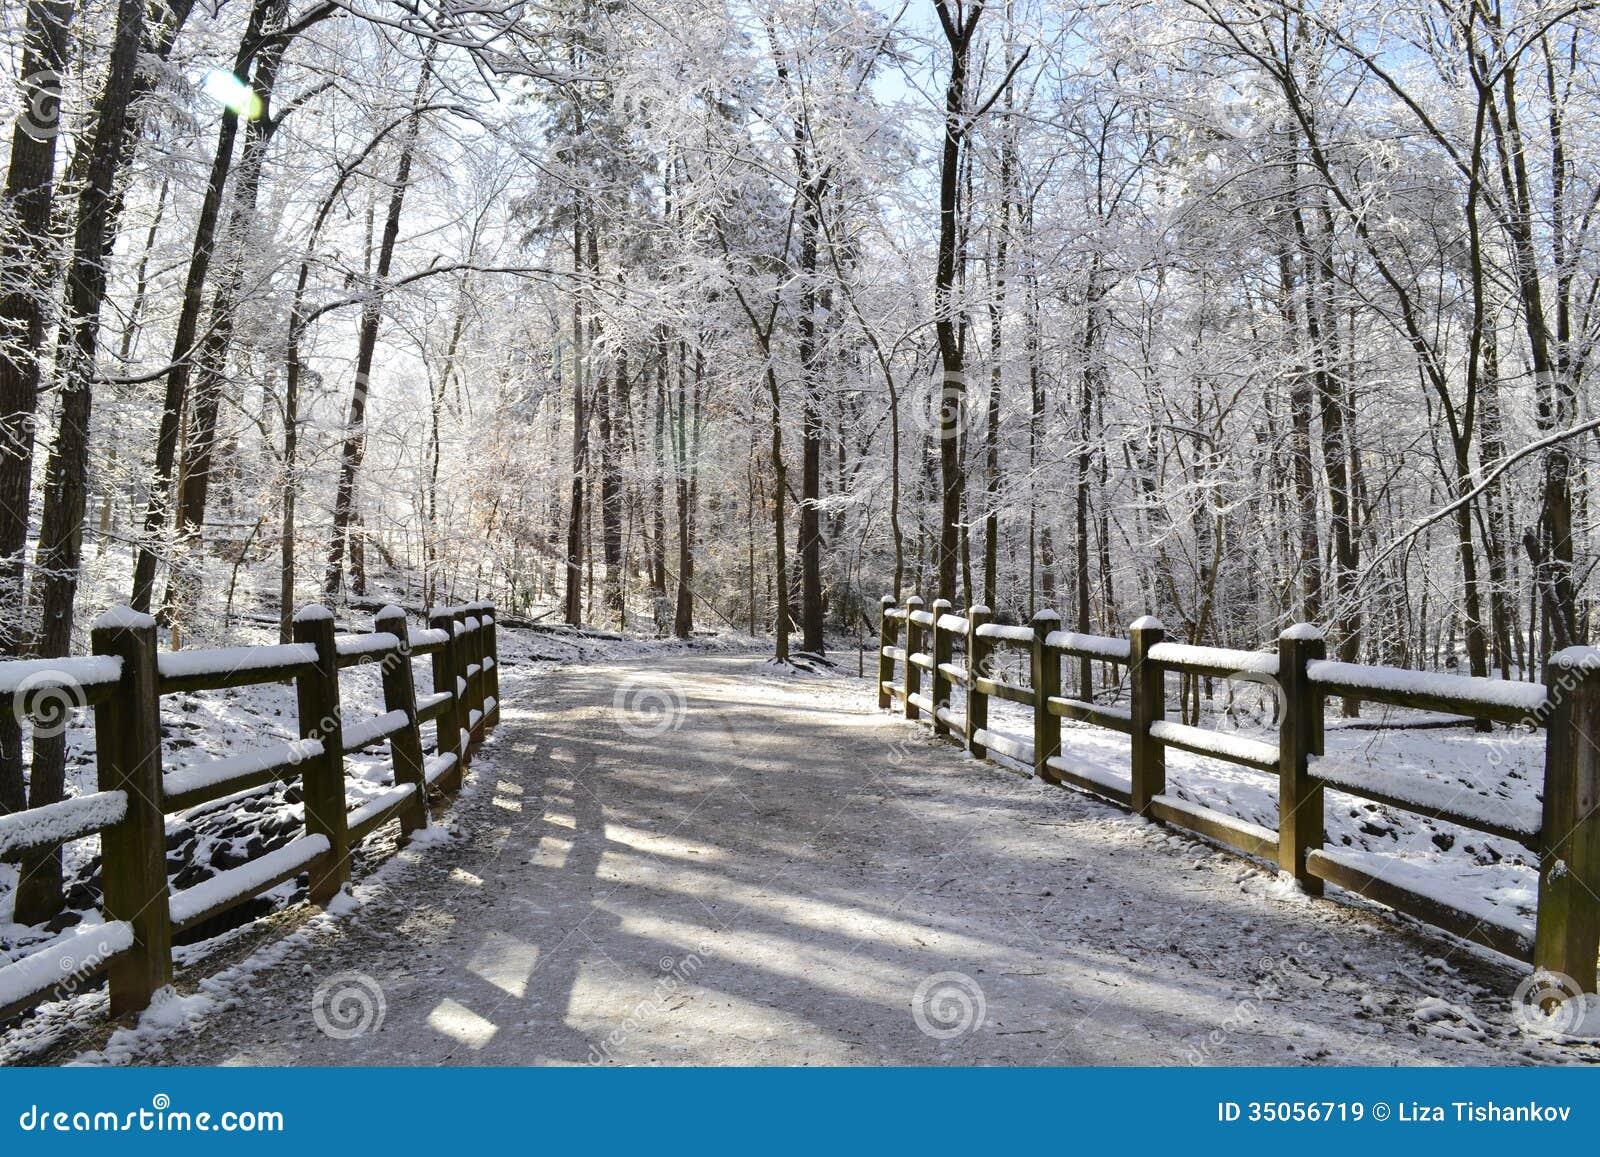 Winter Landscape Clipart Free